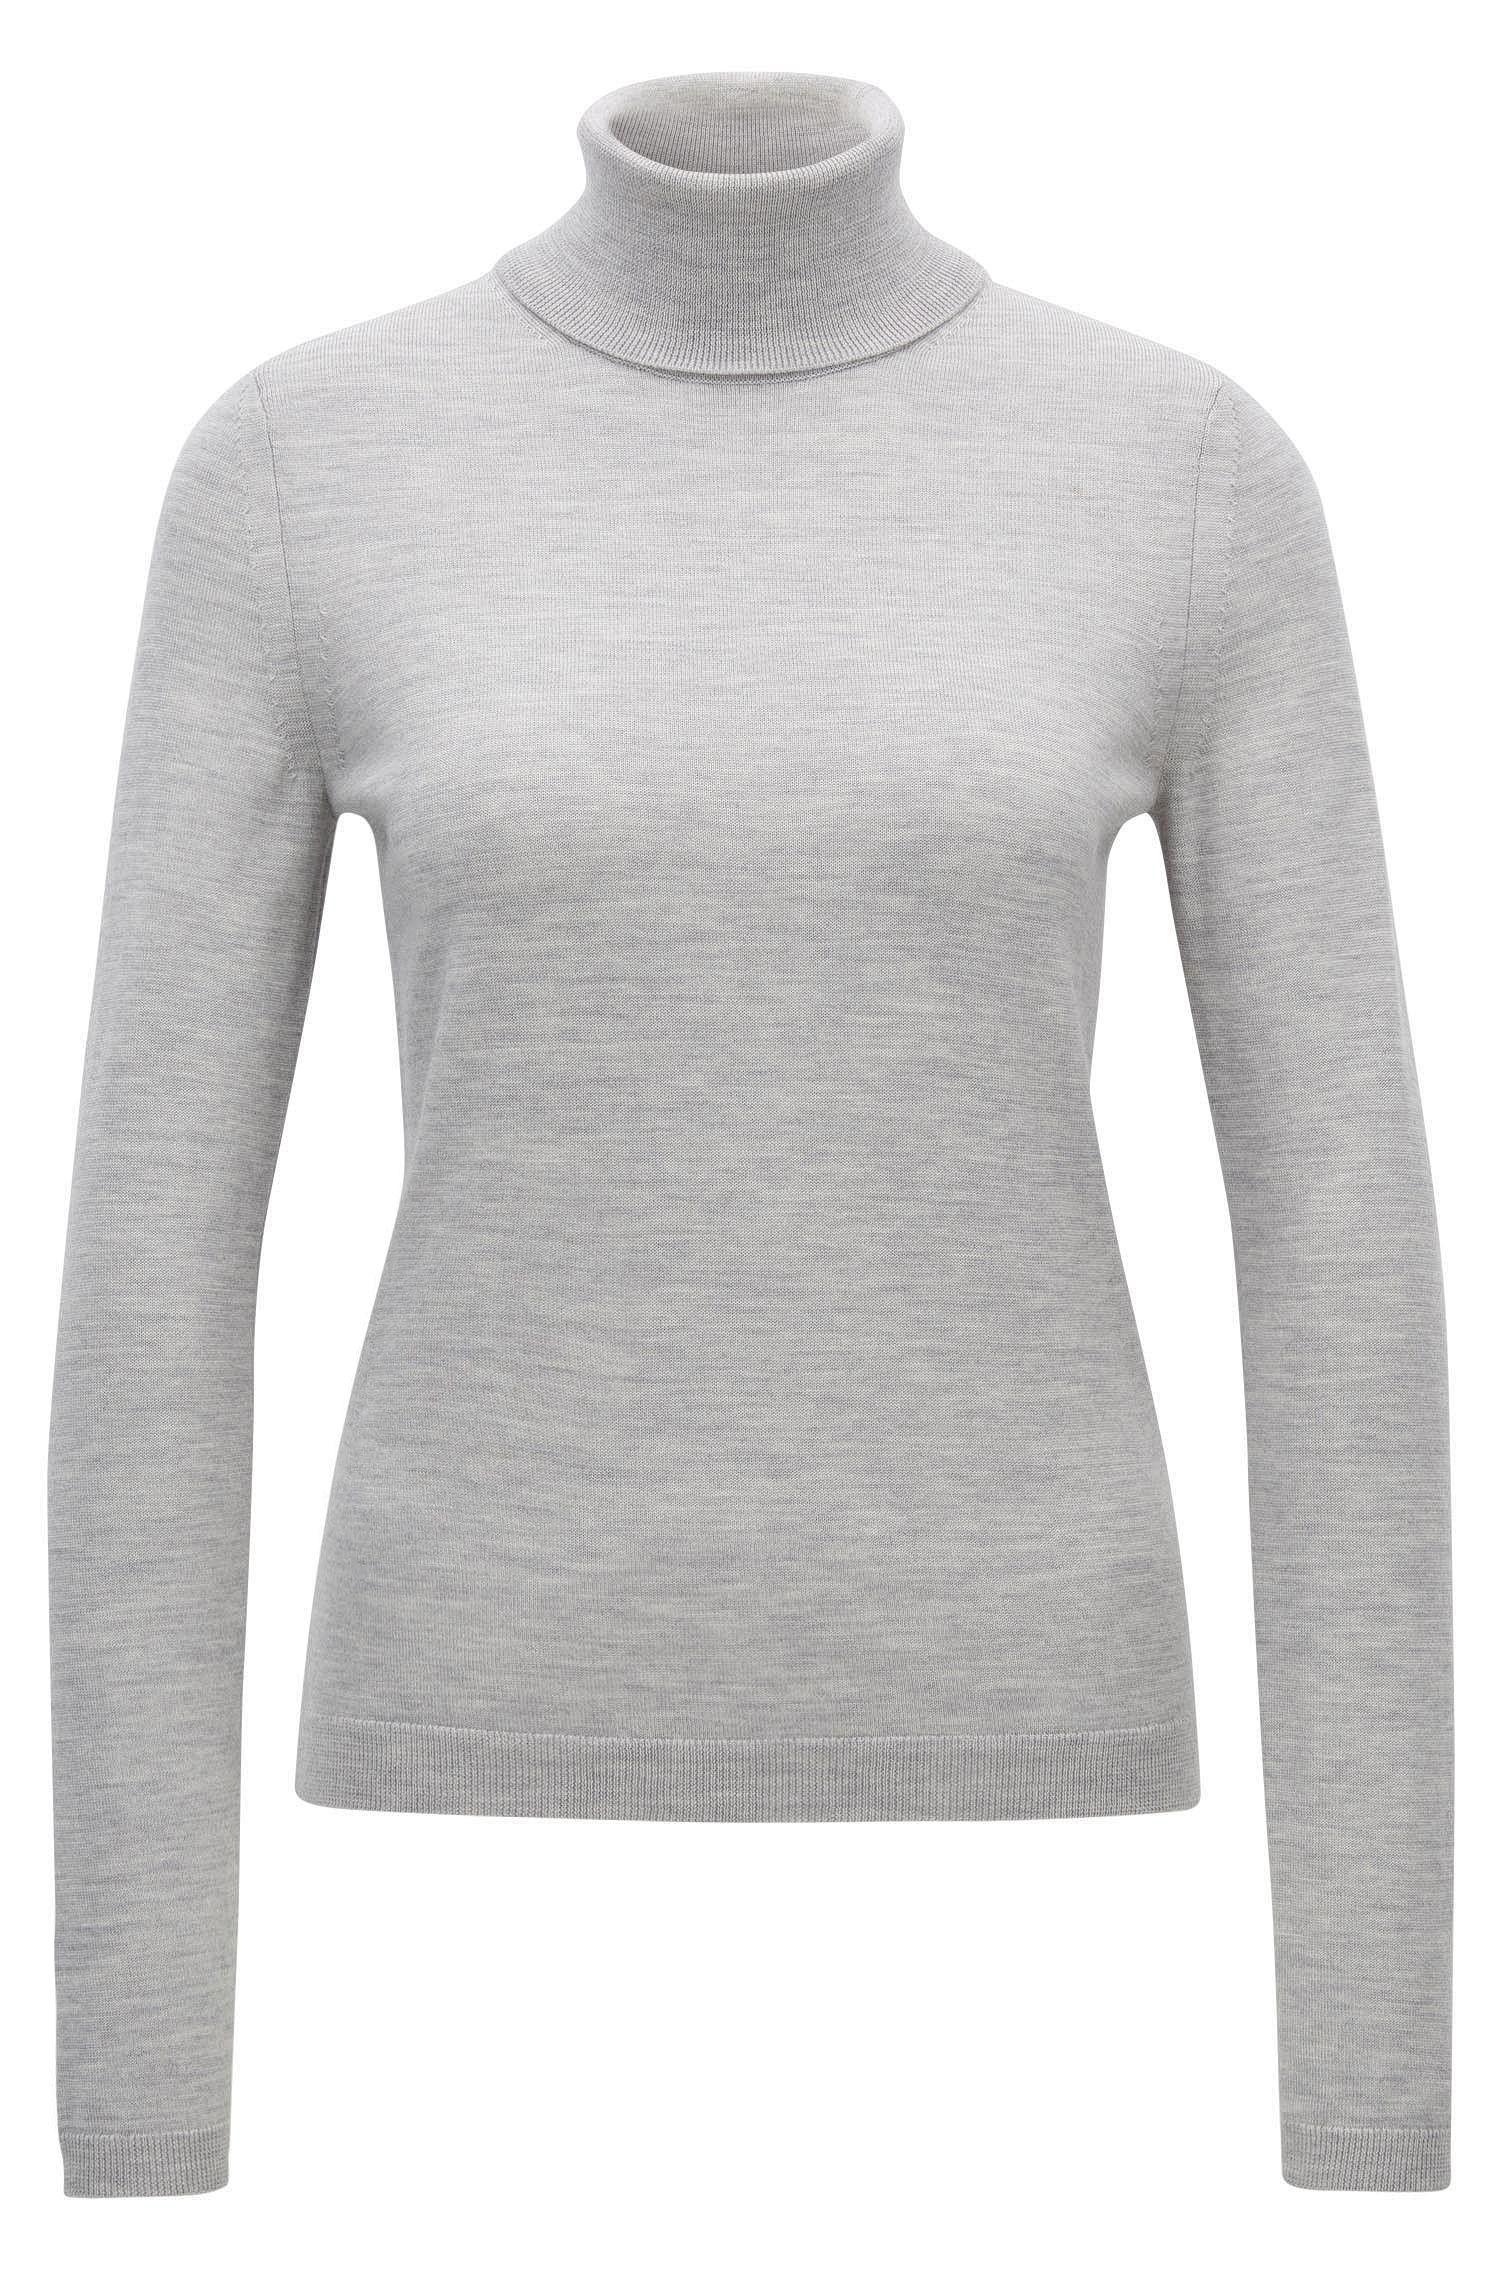 Roll-neck sweater in mercerised Merino wool